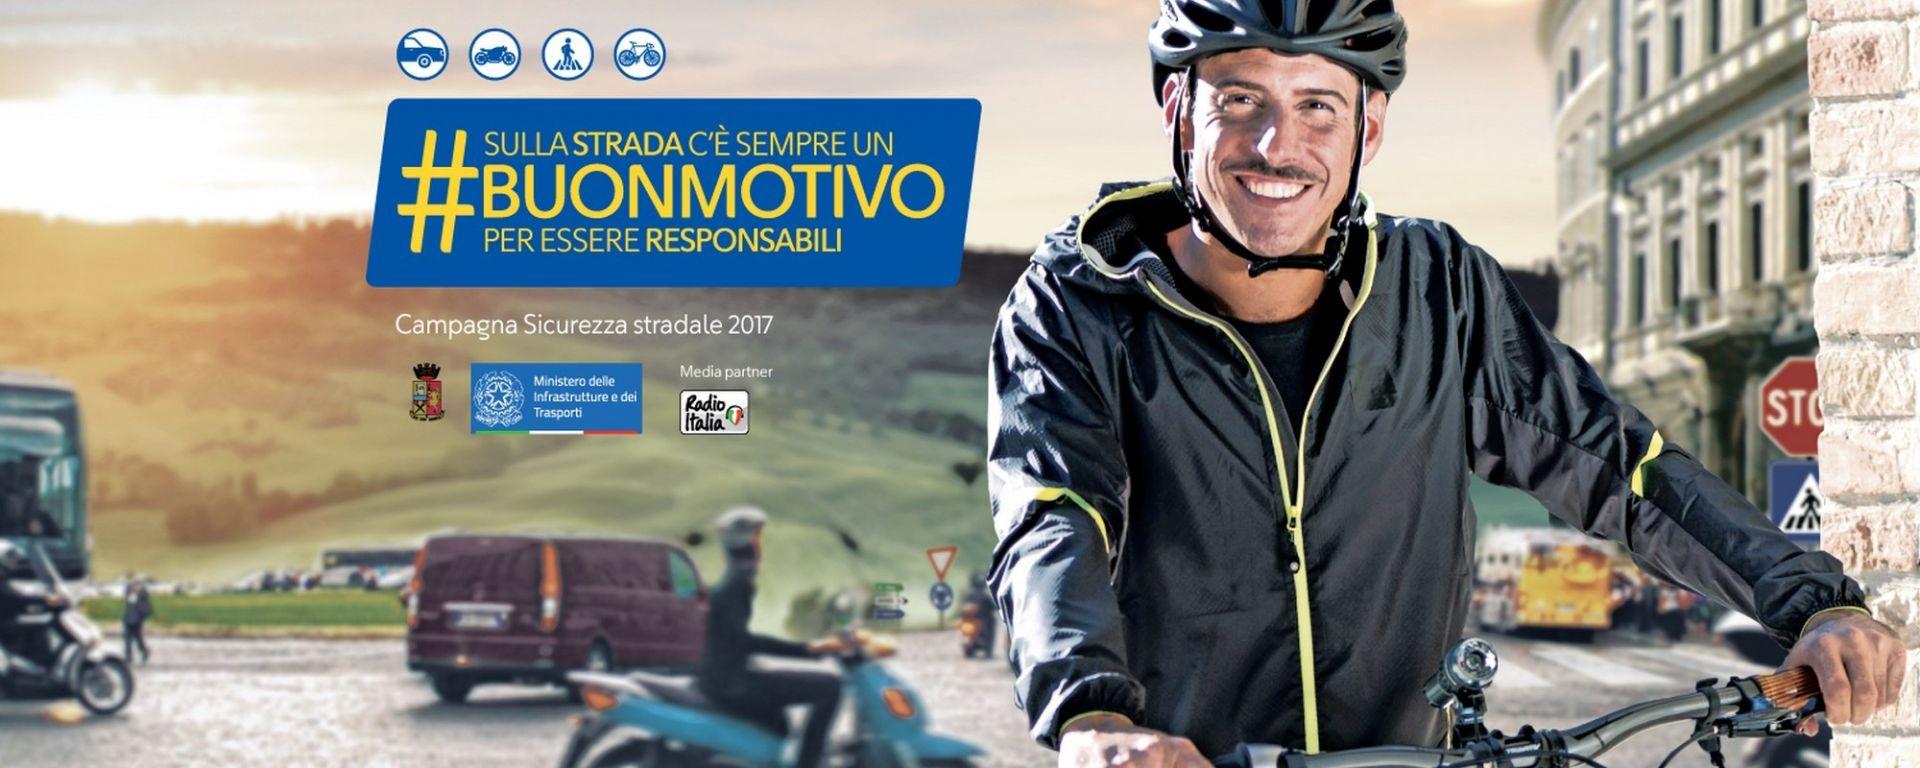 Campagna ANAS #buonmotivo, la locandina con Francesco Gabbani